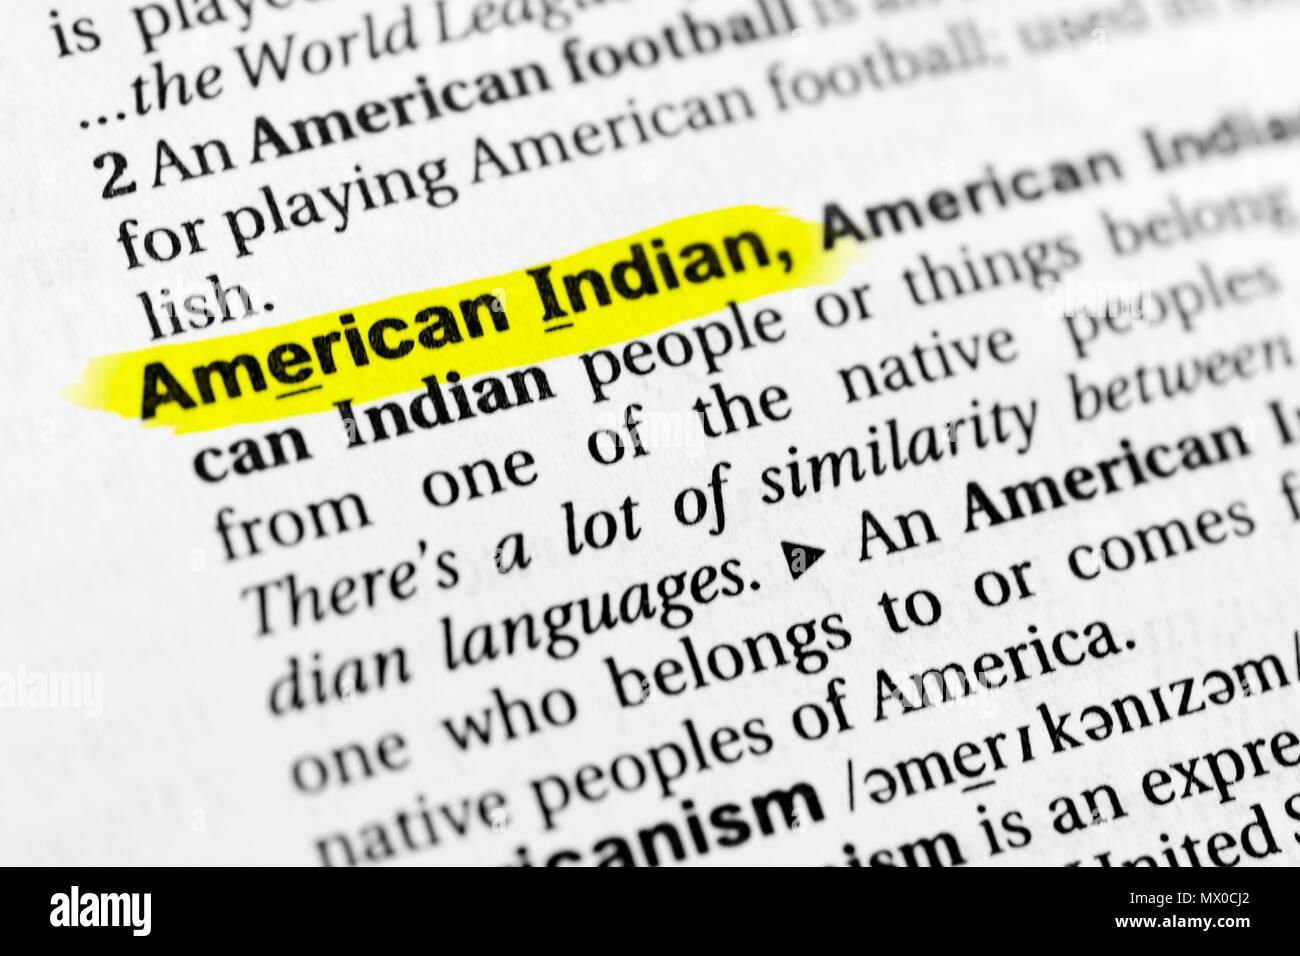 100 Americanism americanism stock photos & americanism stock images - alamy